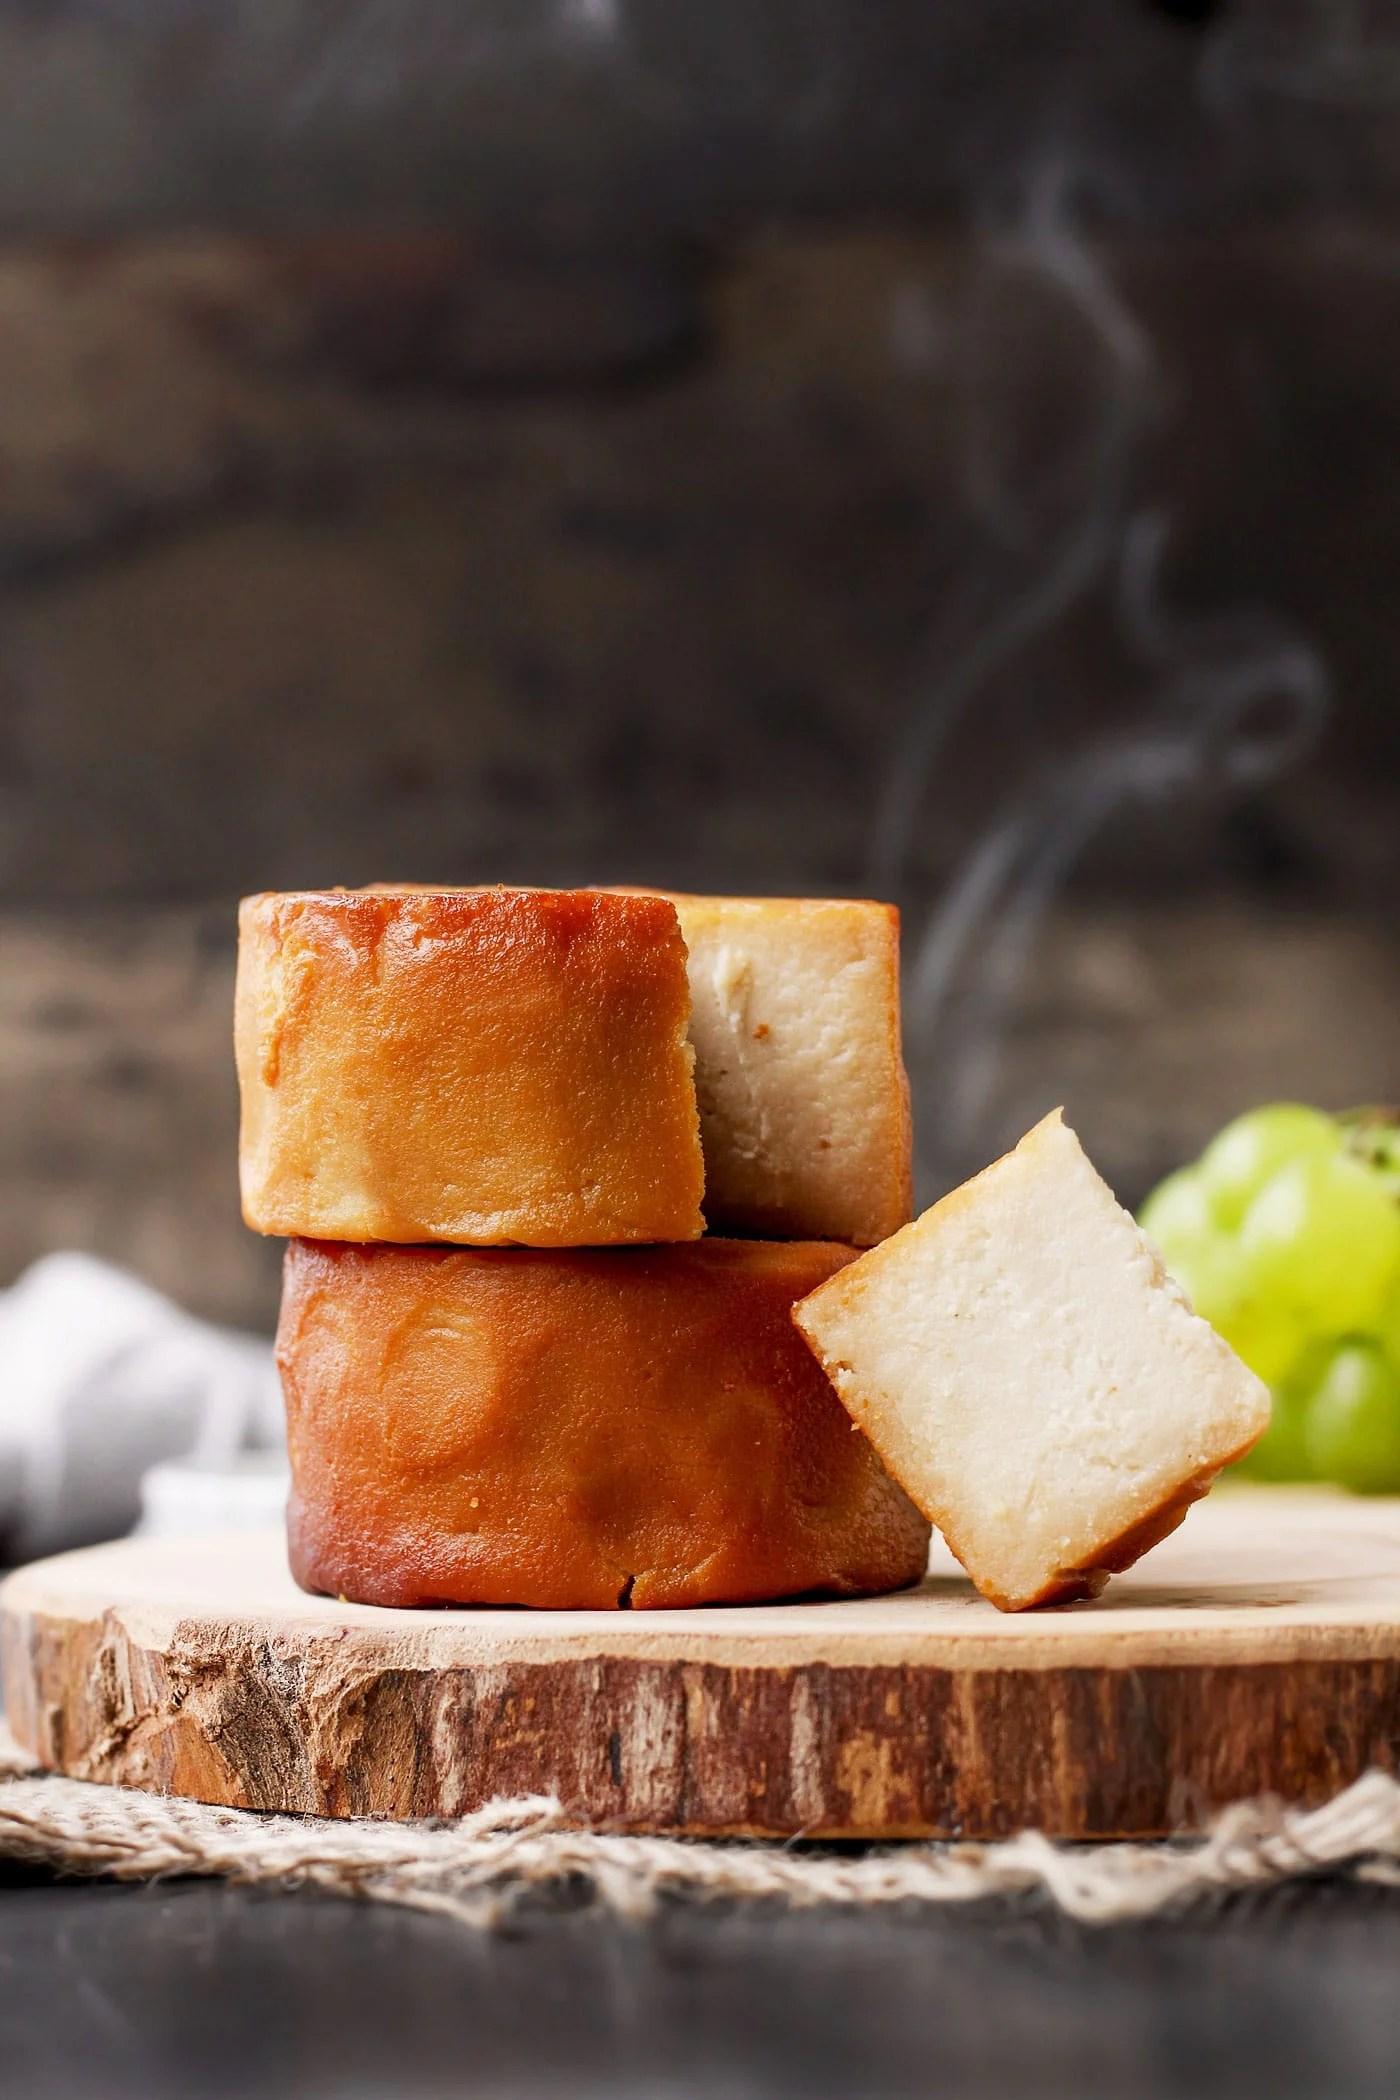 Hickory Smoked Vegan Cheese - Full of Plants